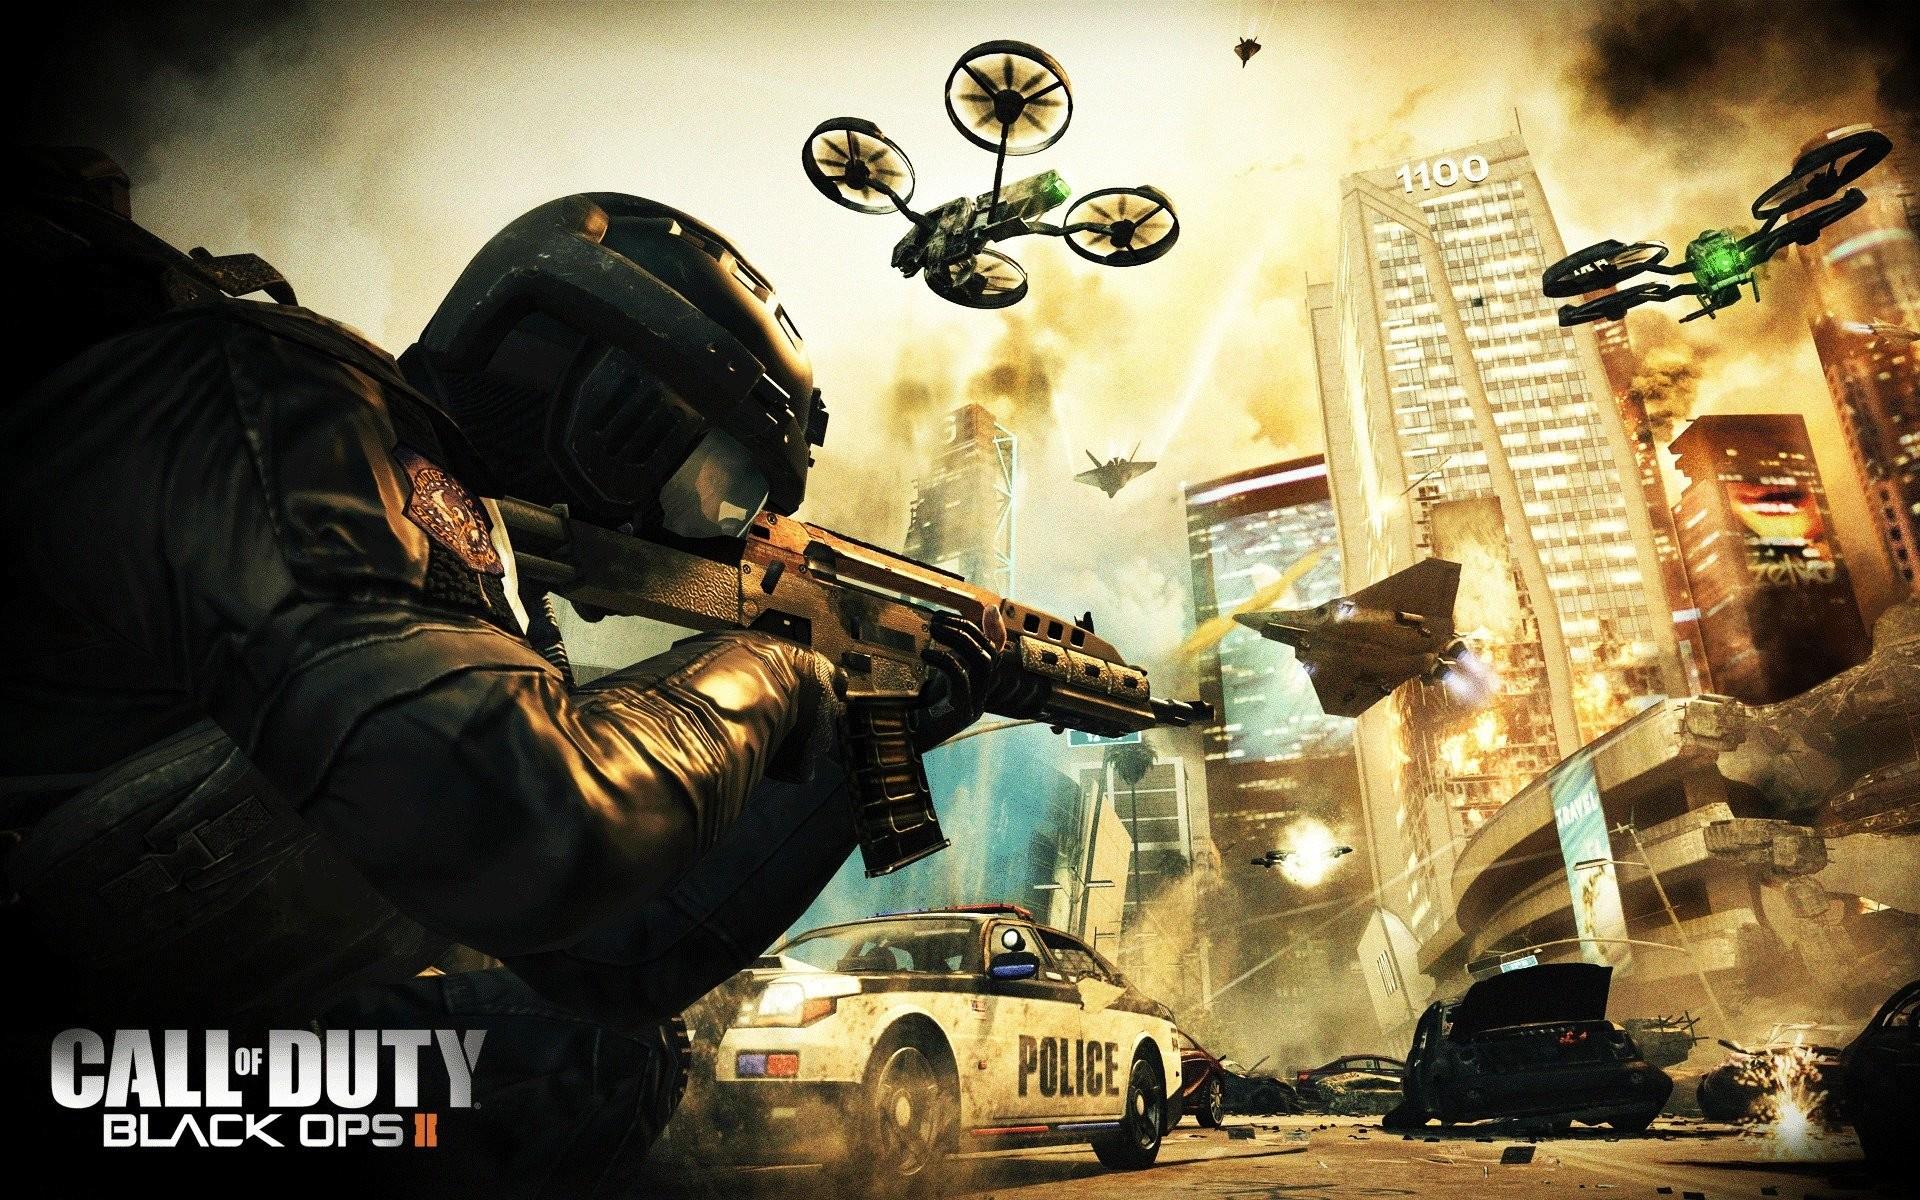 Call Of Duty HD Game Wallpaper #28480 Wallpaper Download HD .